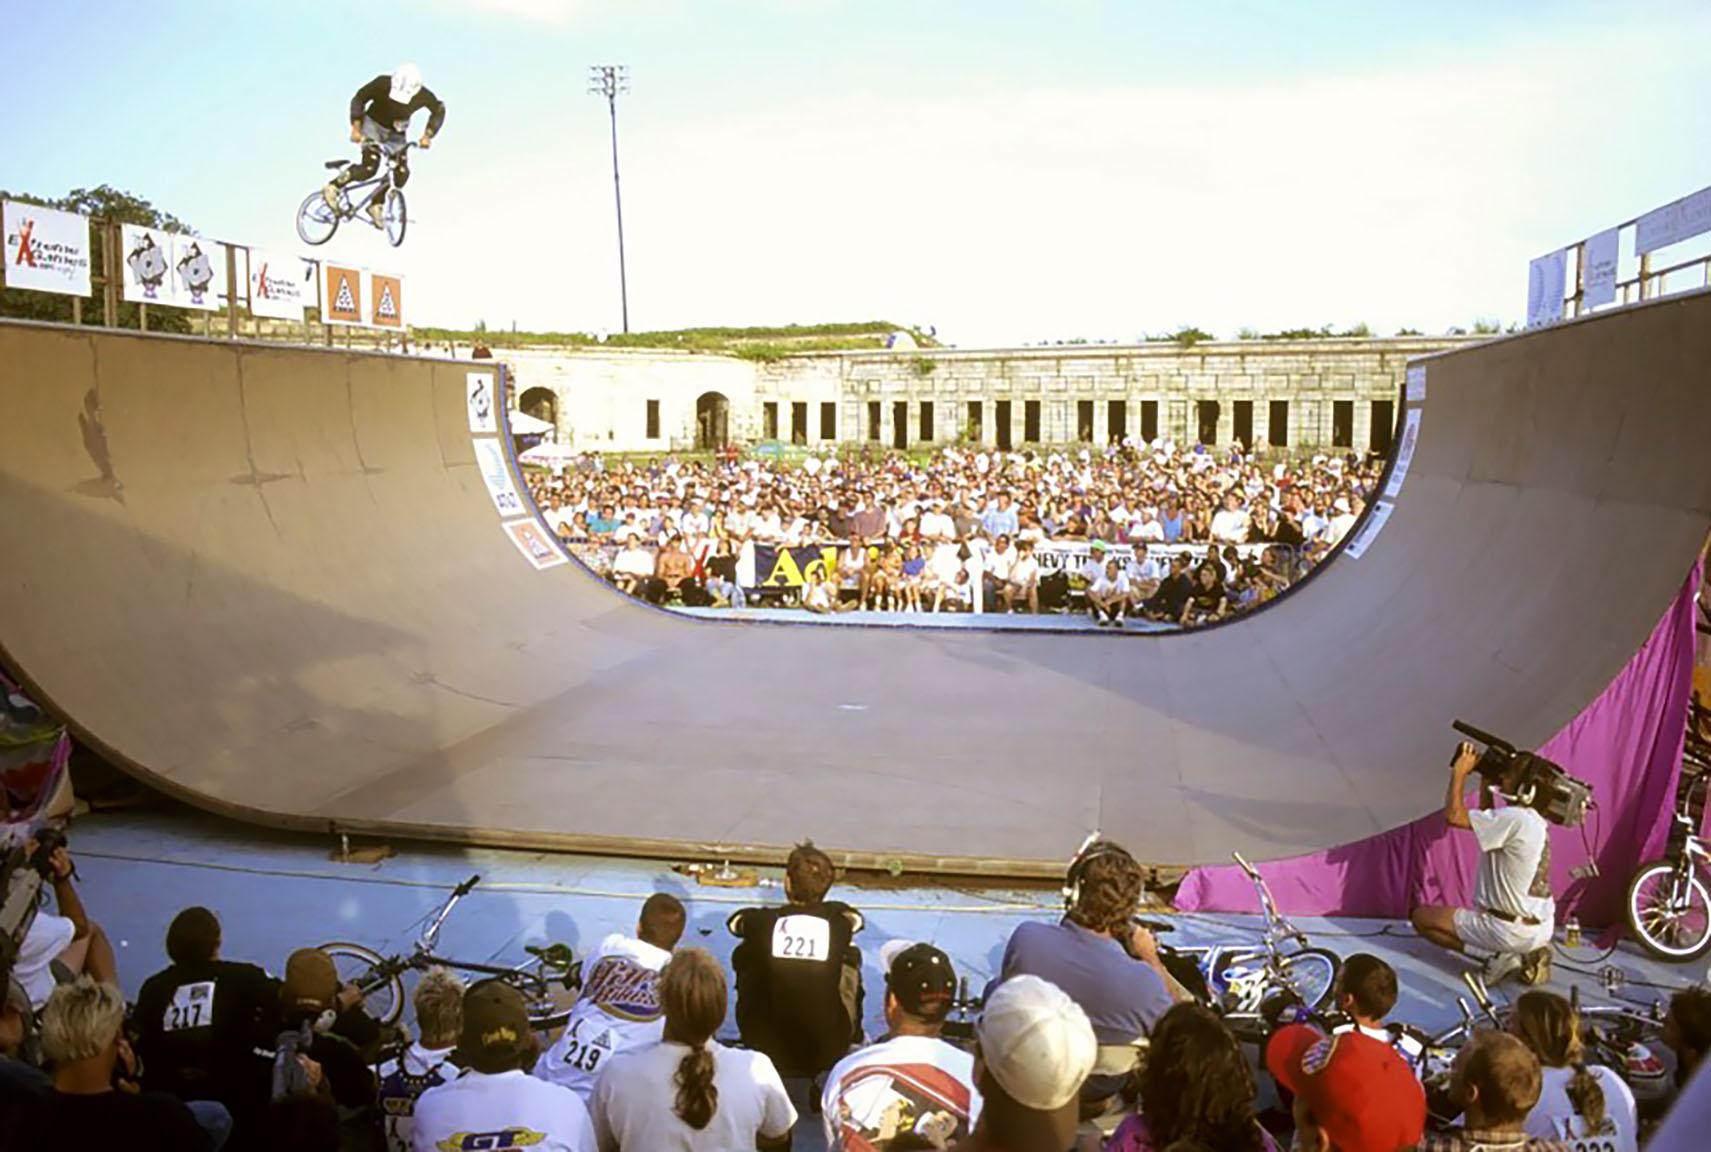 1995: Newport, Rhode Island